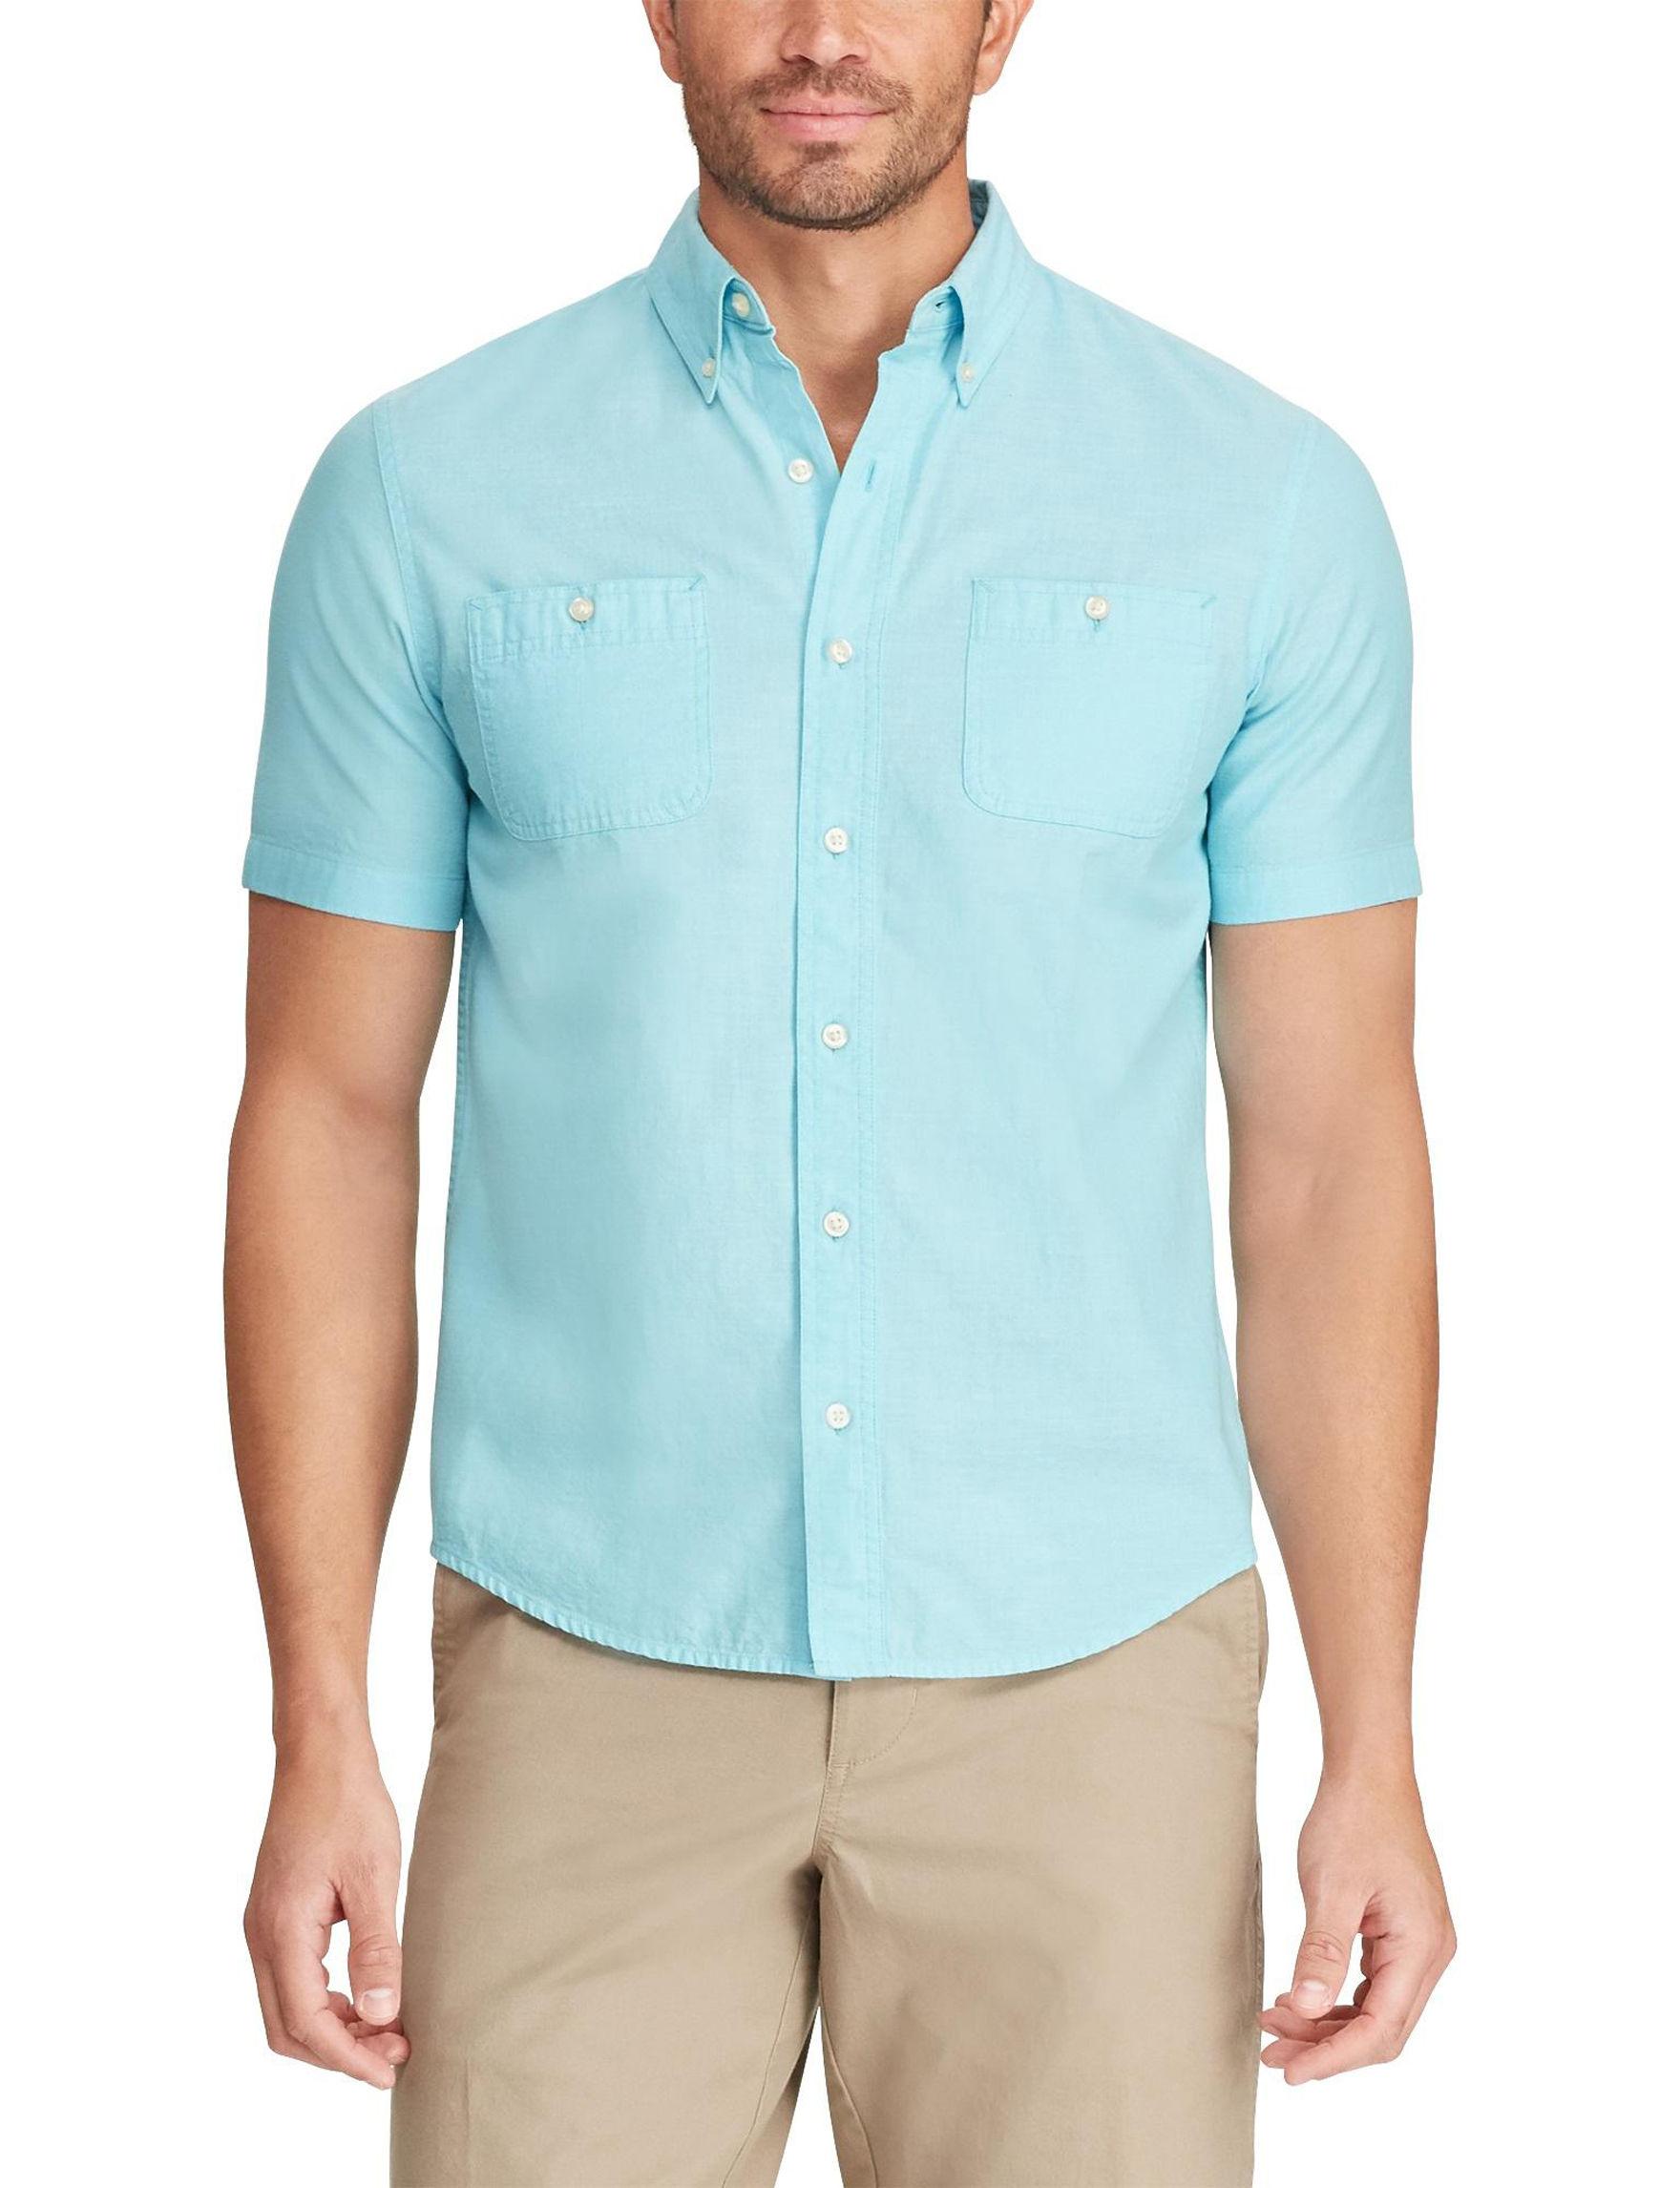 Chaps Hammond Blue Casual Button Down Shirts